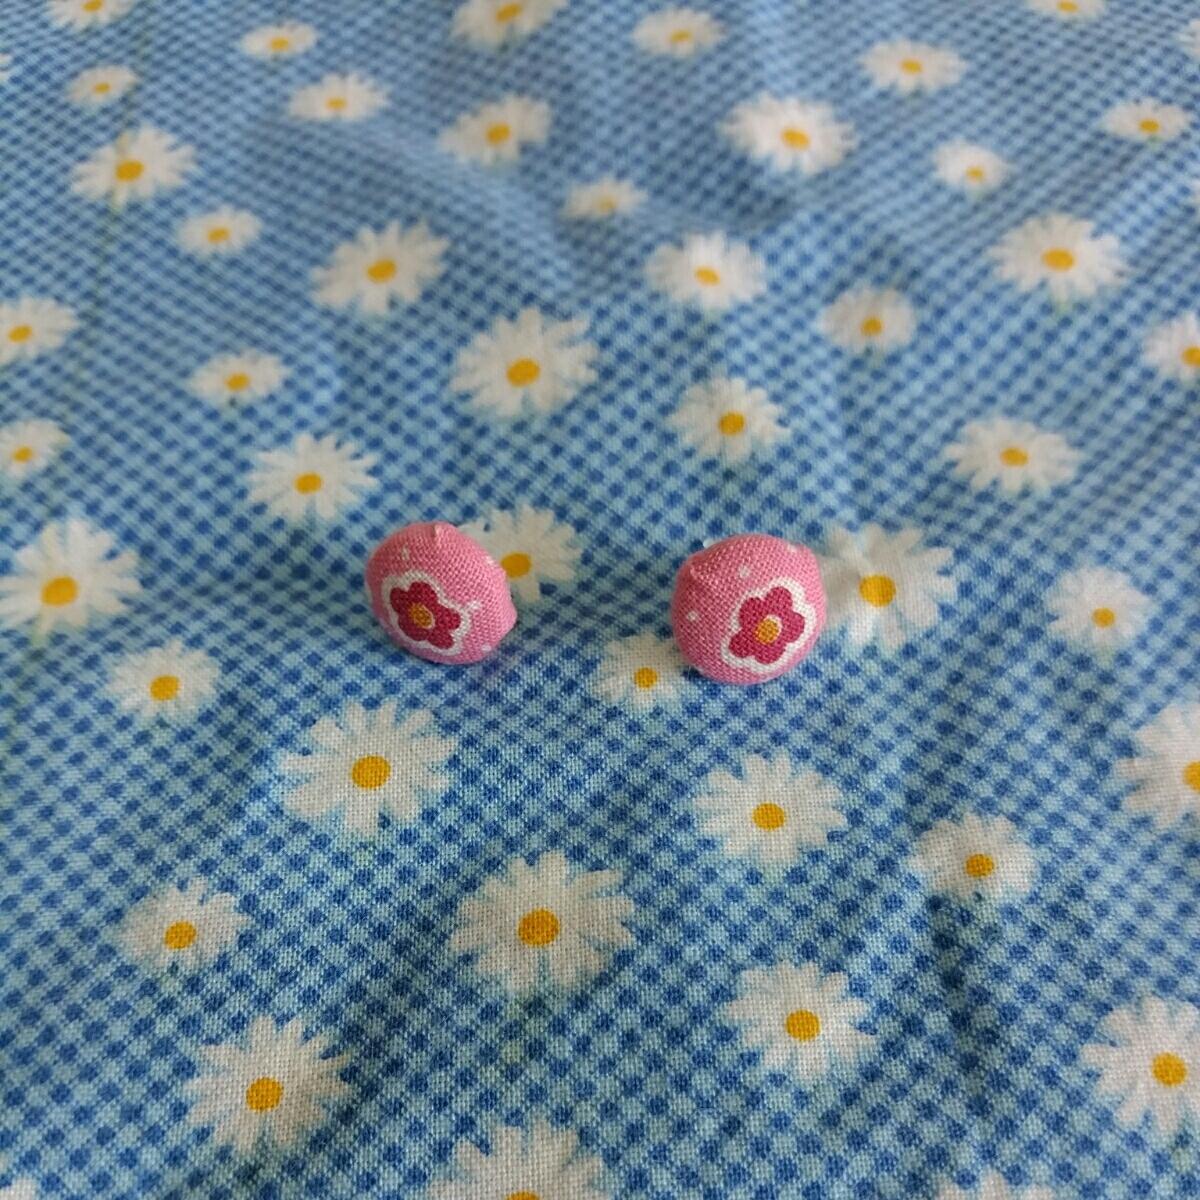 Cute Crull Button Piercing 4 ☆ Handmade